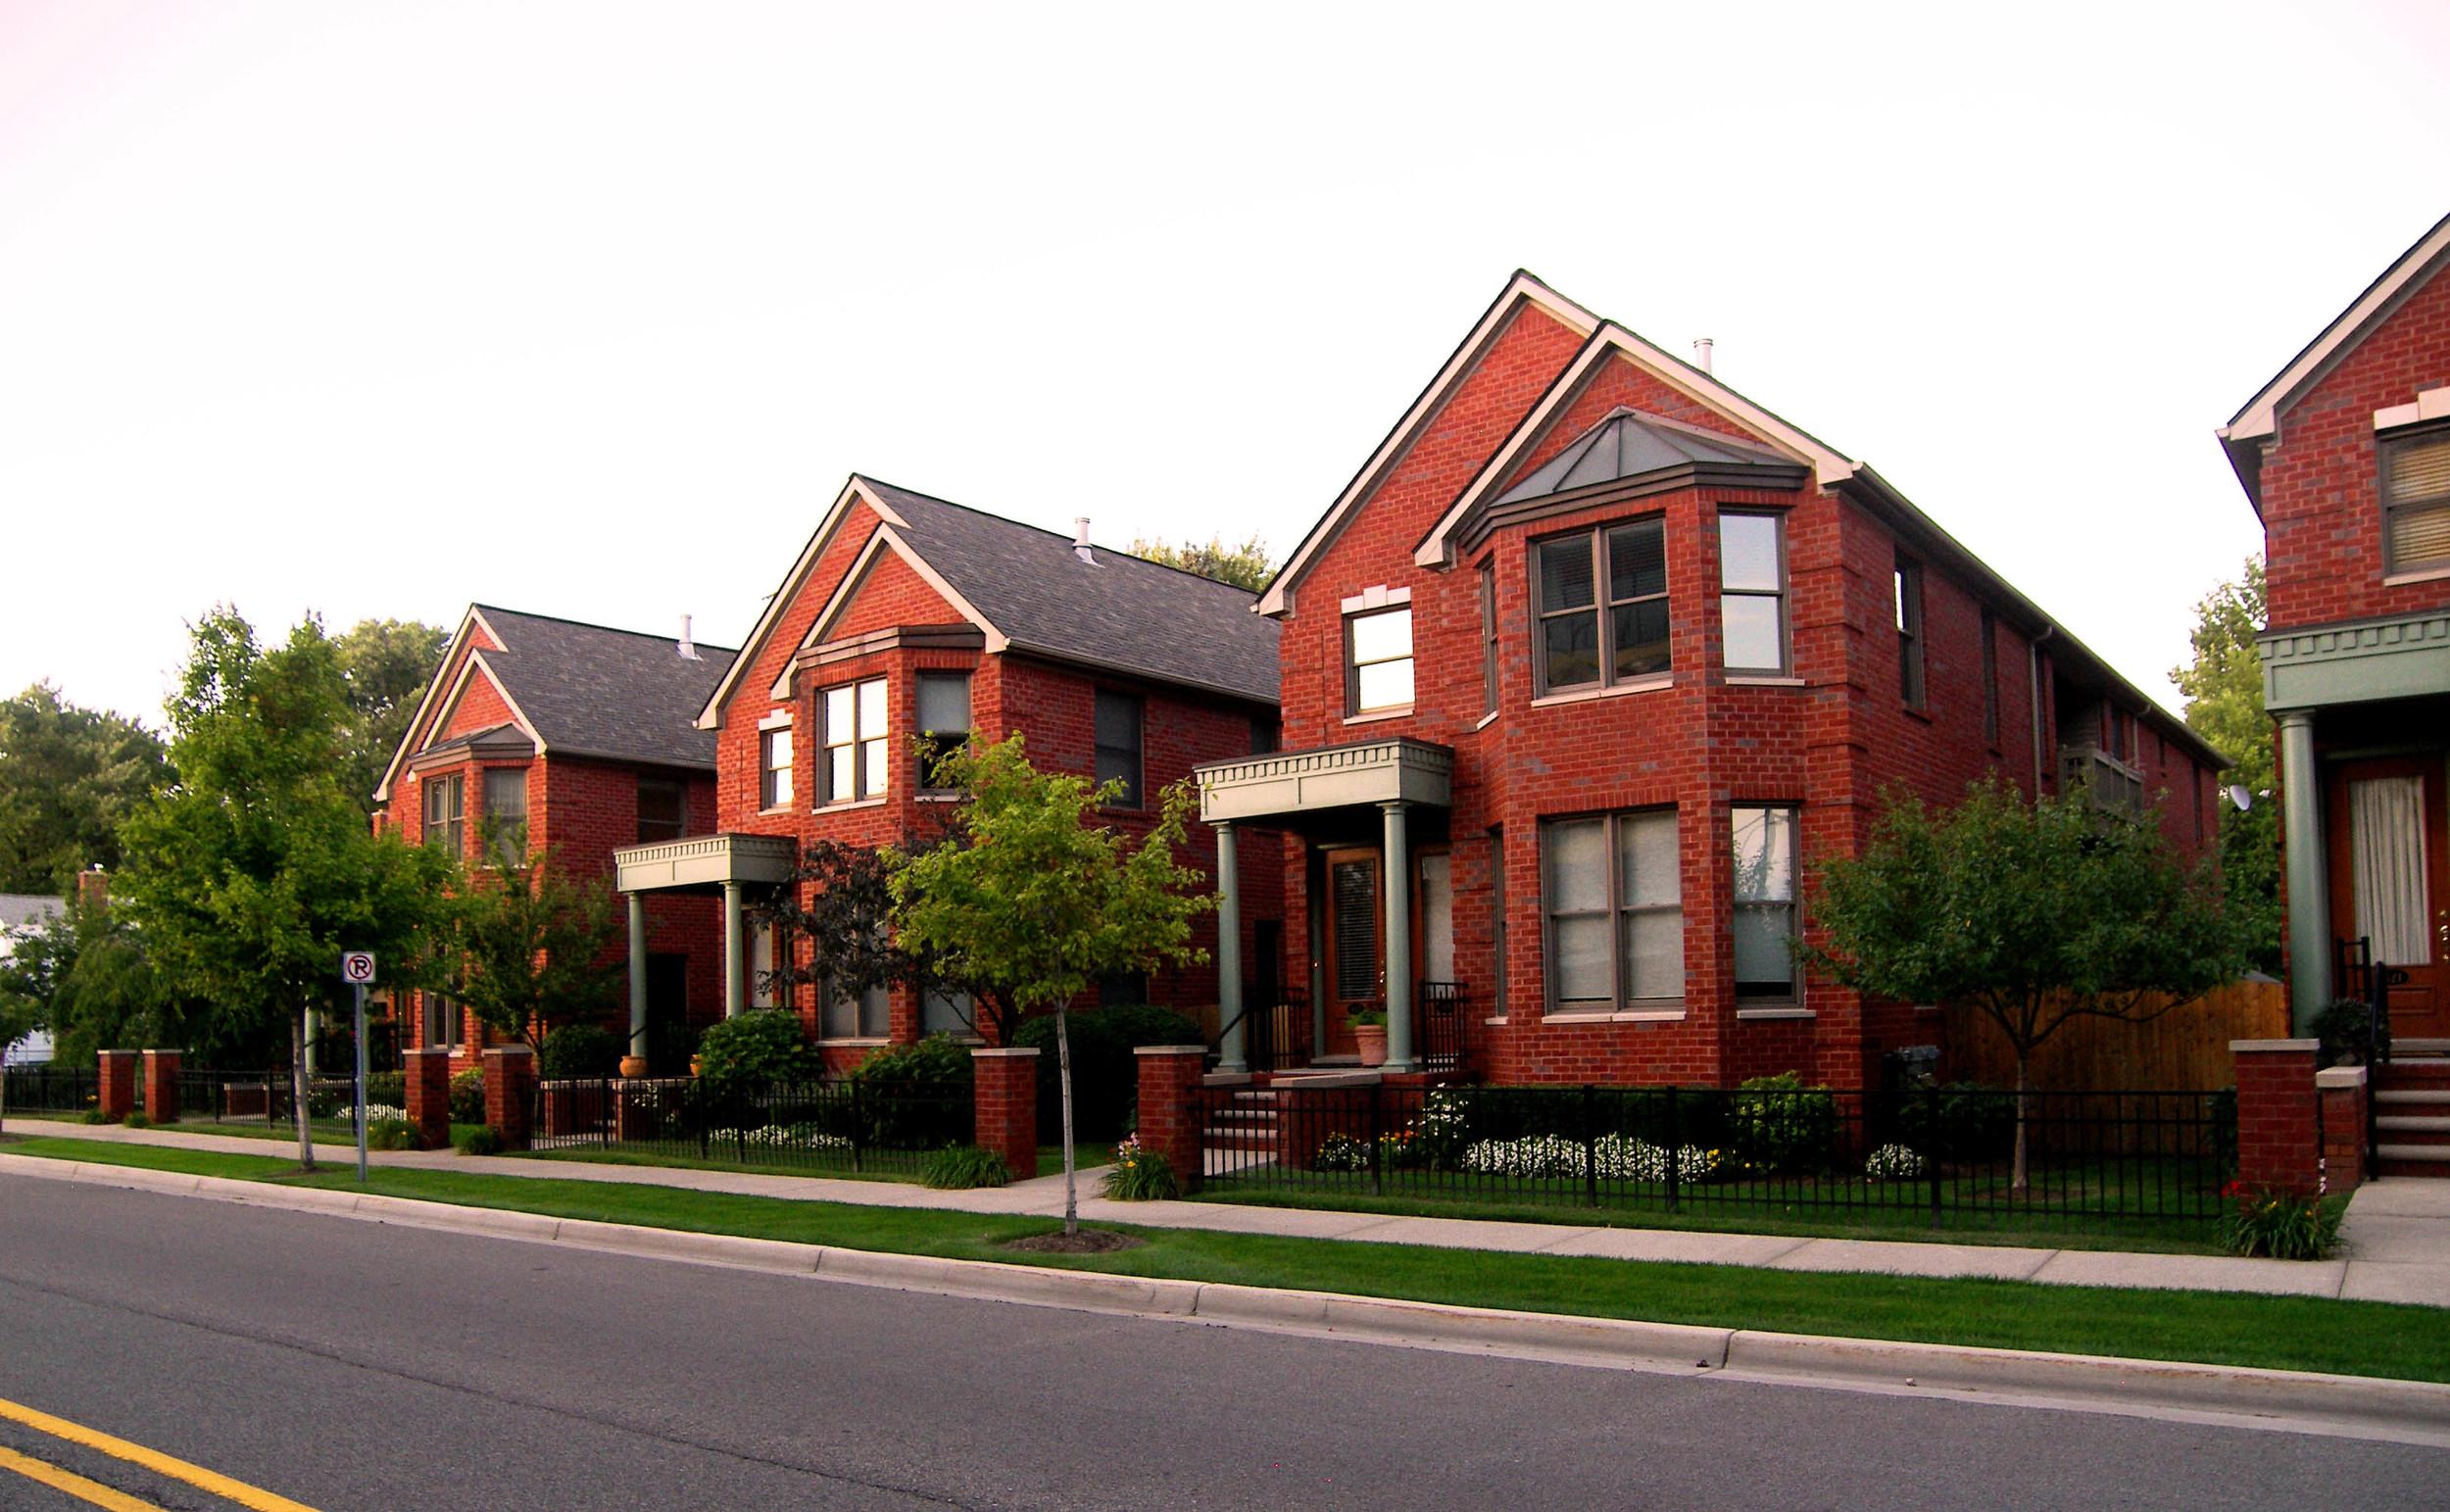 Spruce Manor, Condiminums  Royal Oak, Michigan